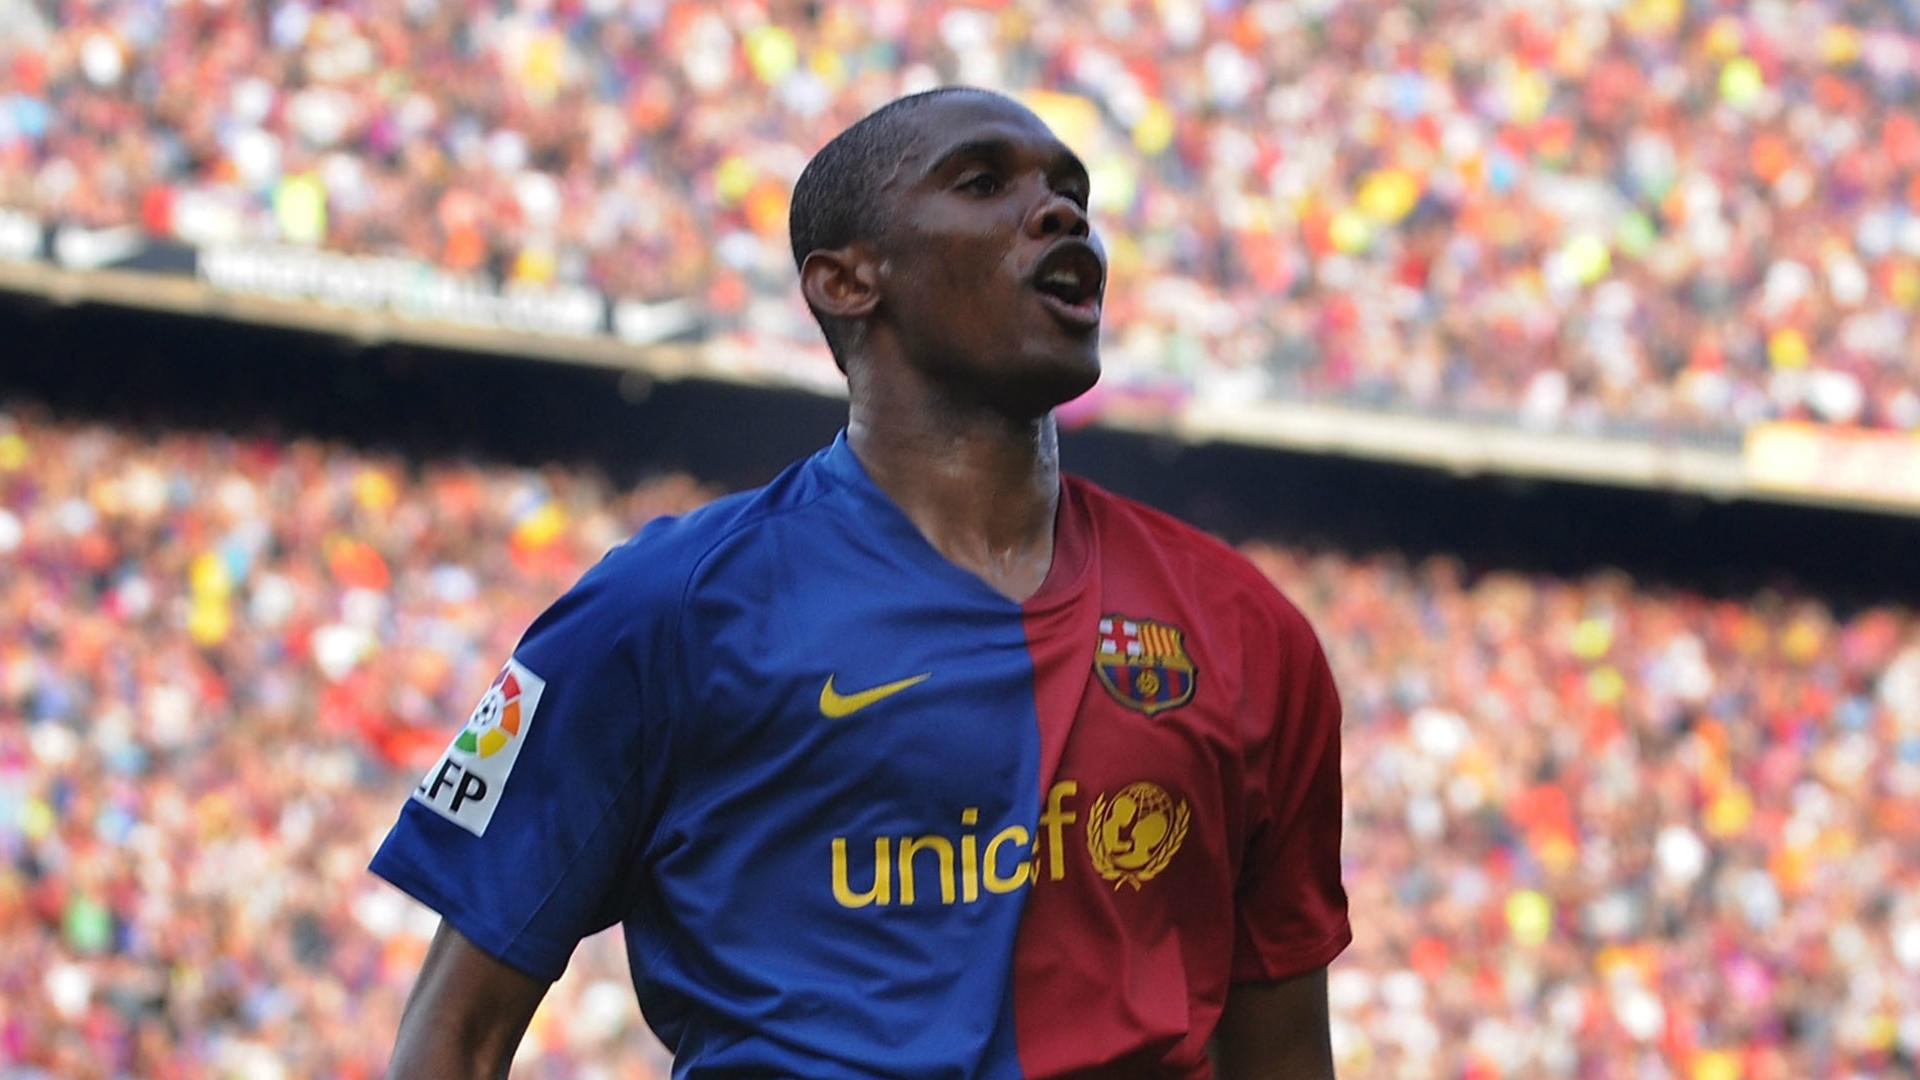 World football salutes Samuel Eto'o after striker retires